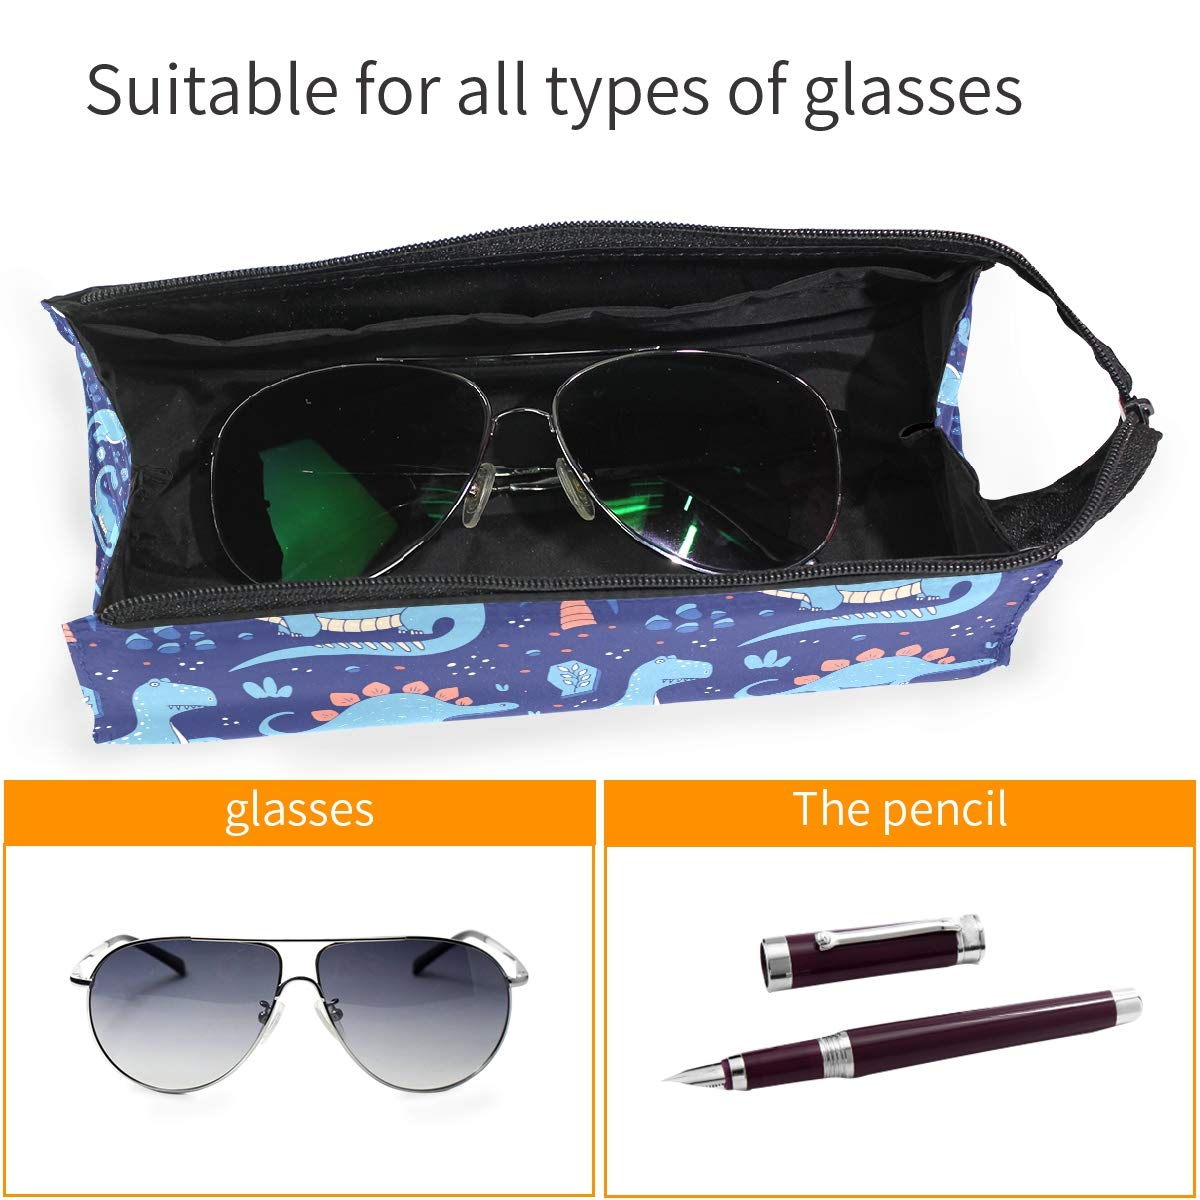 My Little Nest Eyeglass Sunglasses Holder Pouch Bag Blue Dinosaurs Multi Function Zipper Pen Case Pencil Bag Organizer